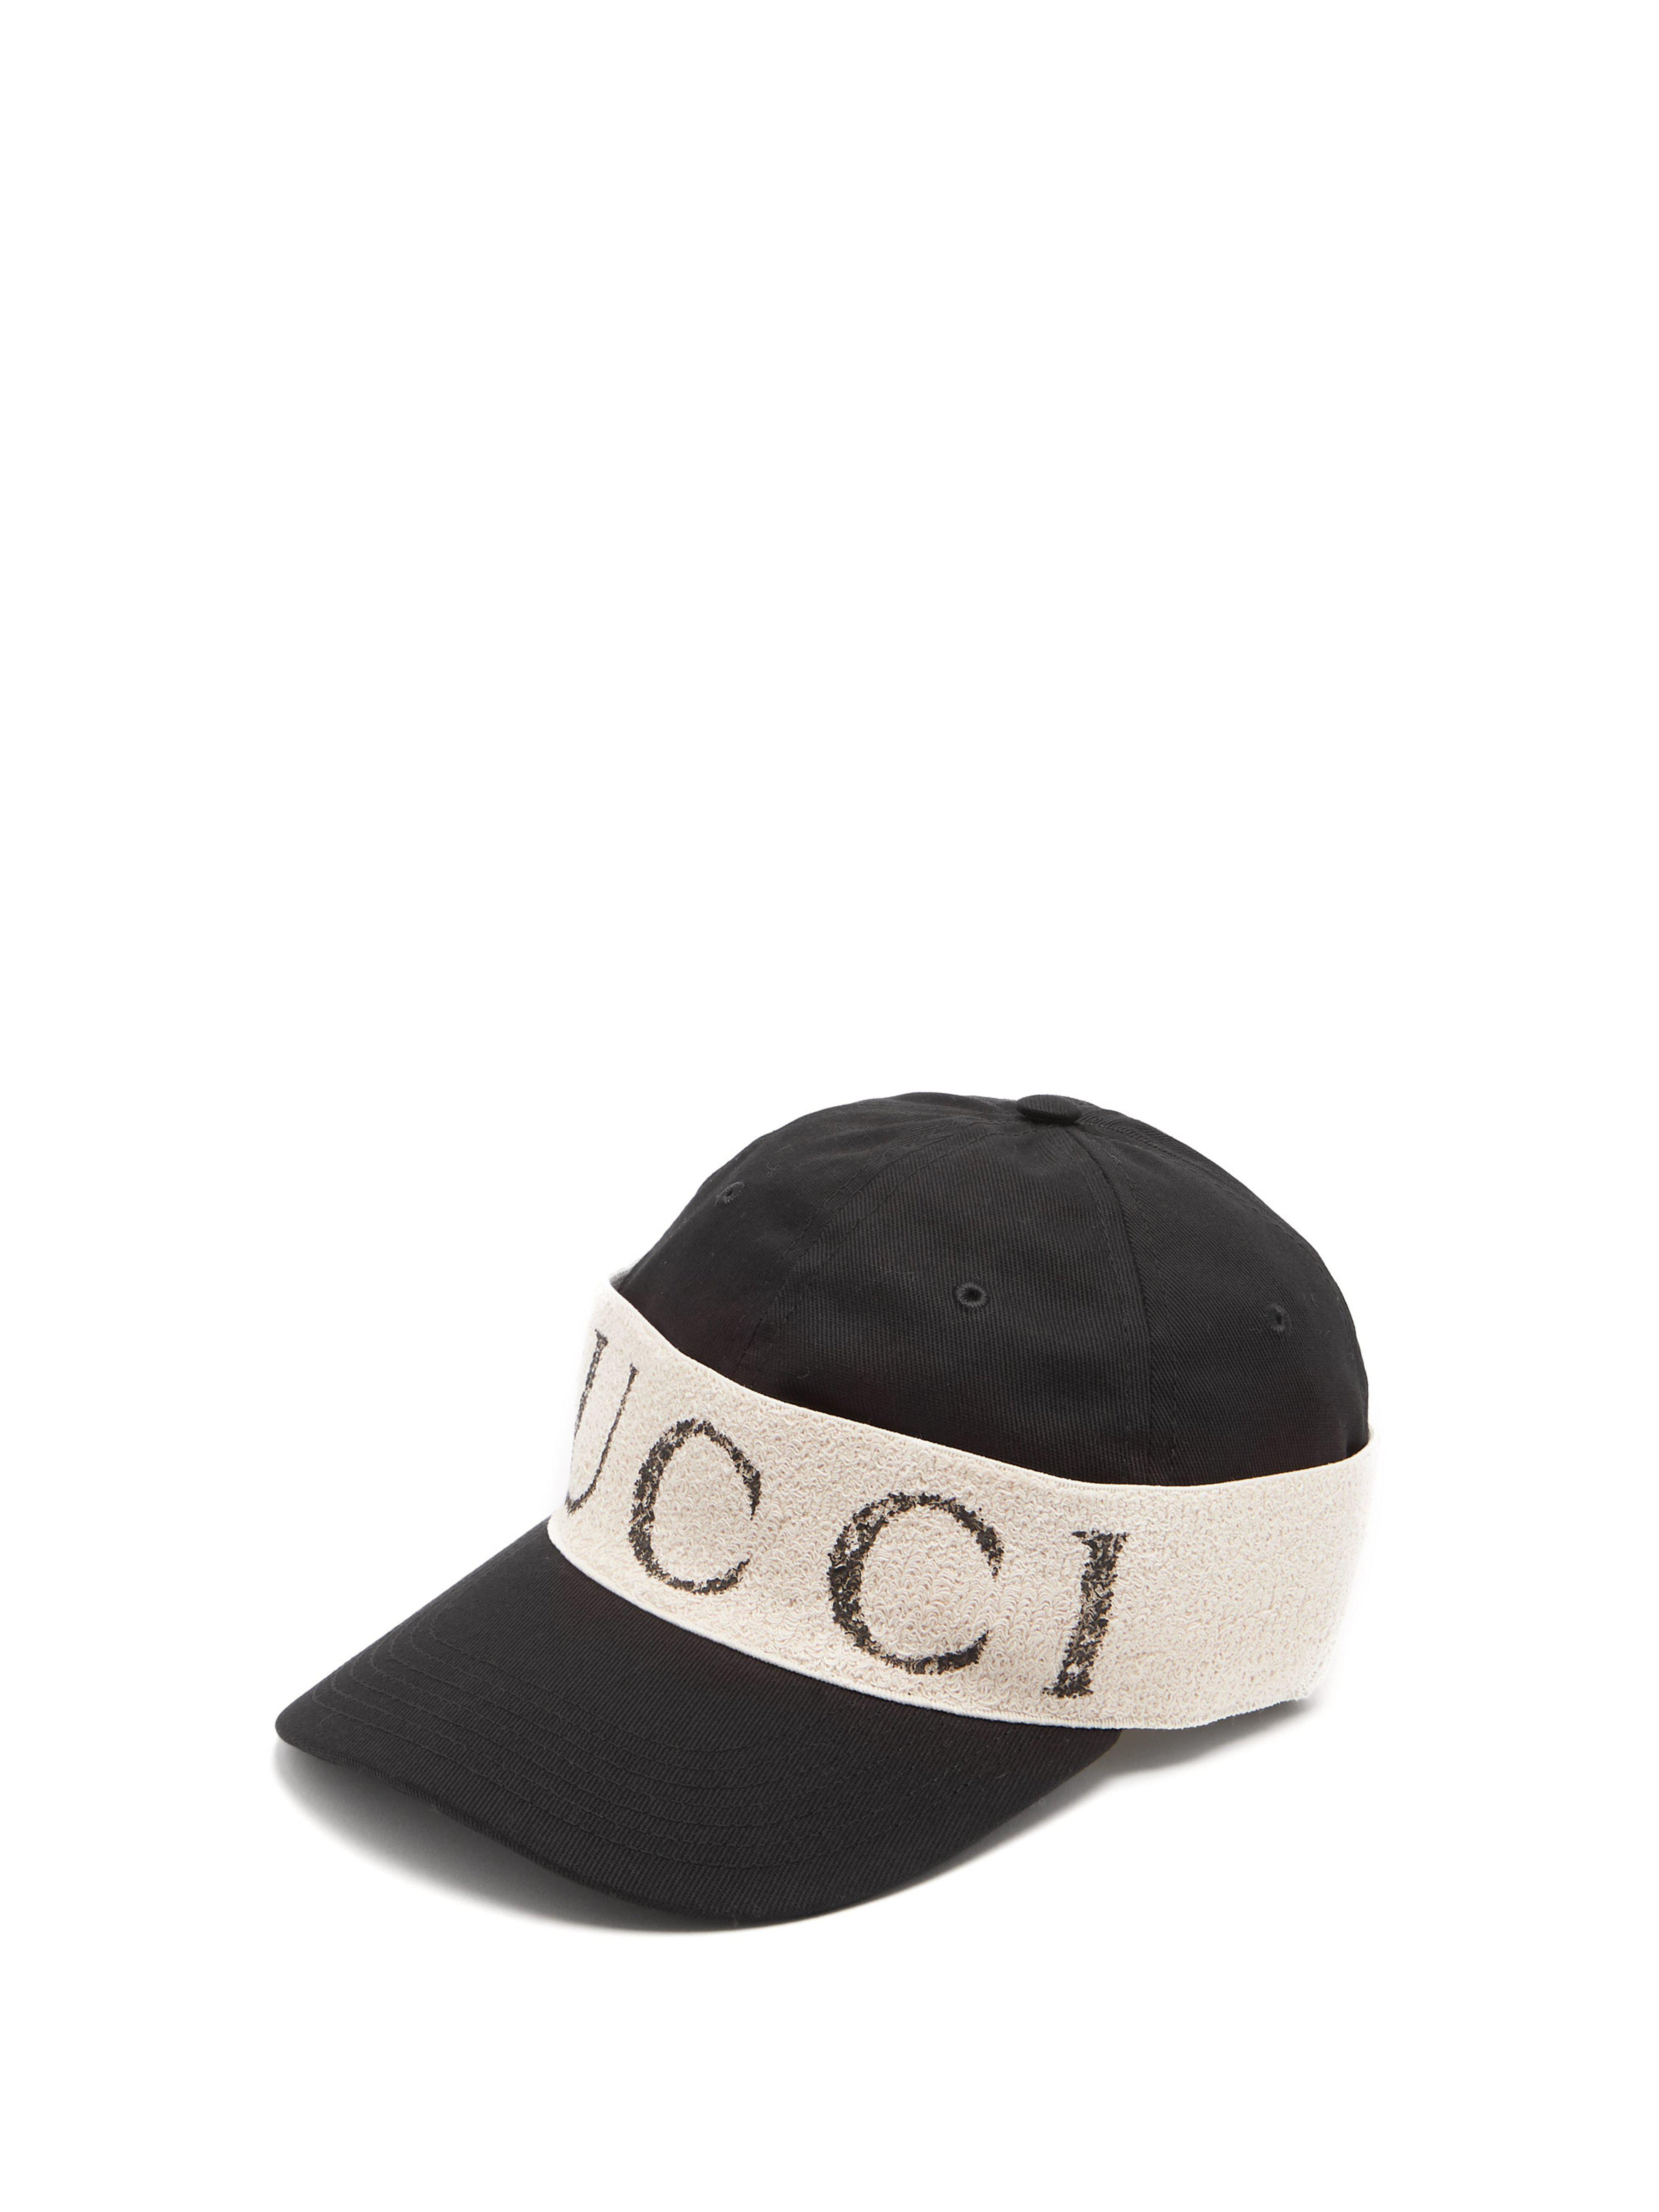 58498800a6b Gucci Logo Print Cotton Cap in Black for Men - Lyst